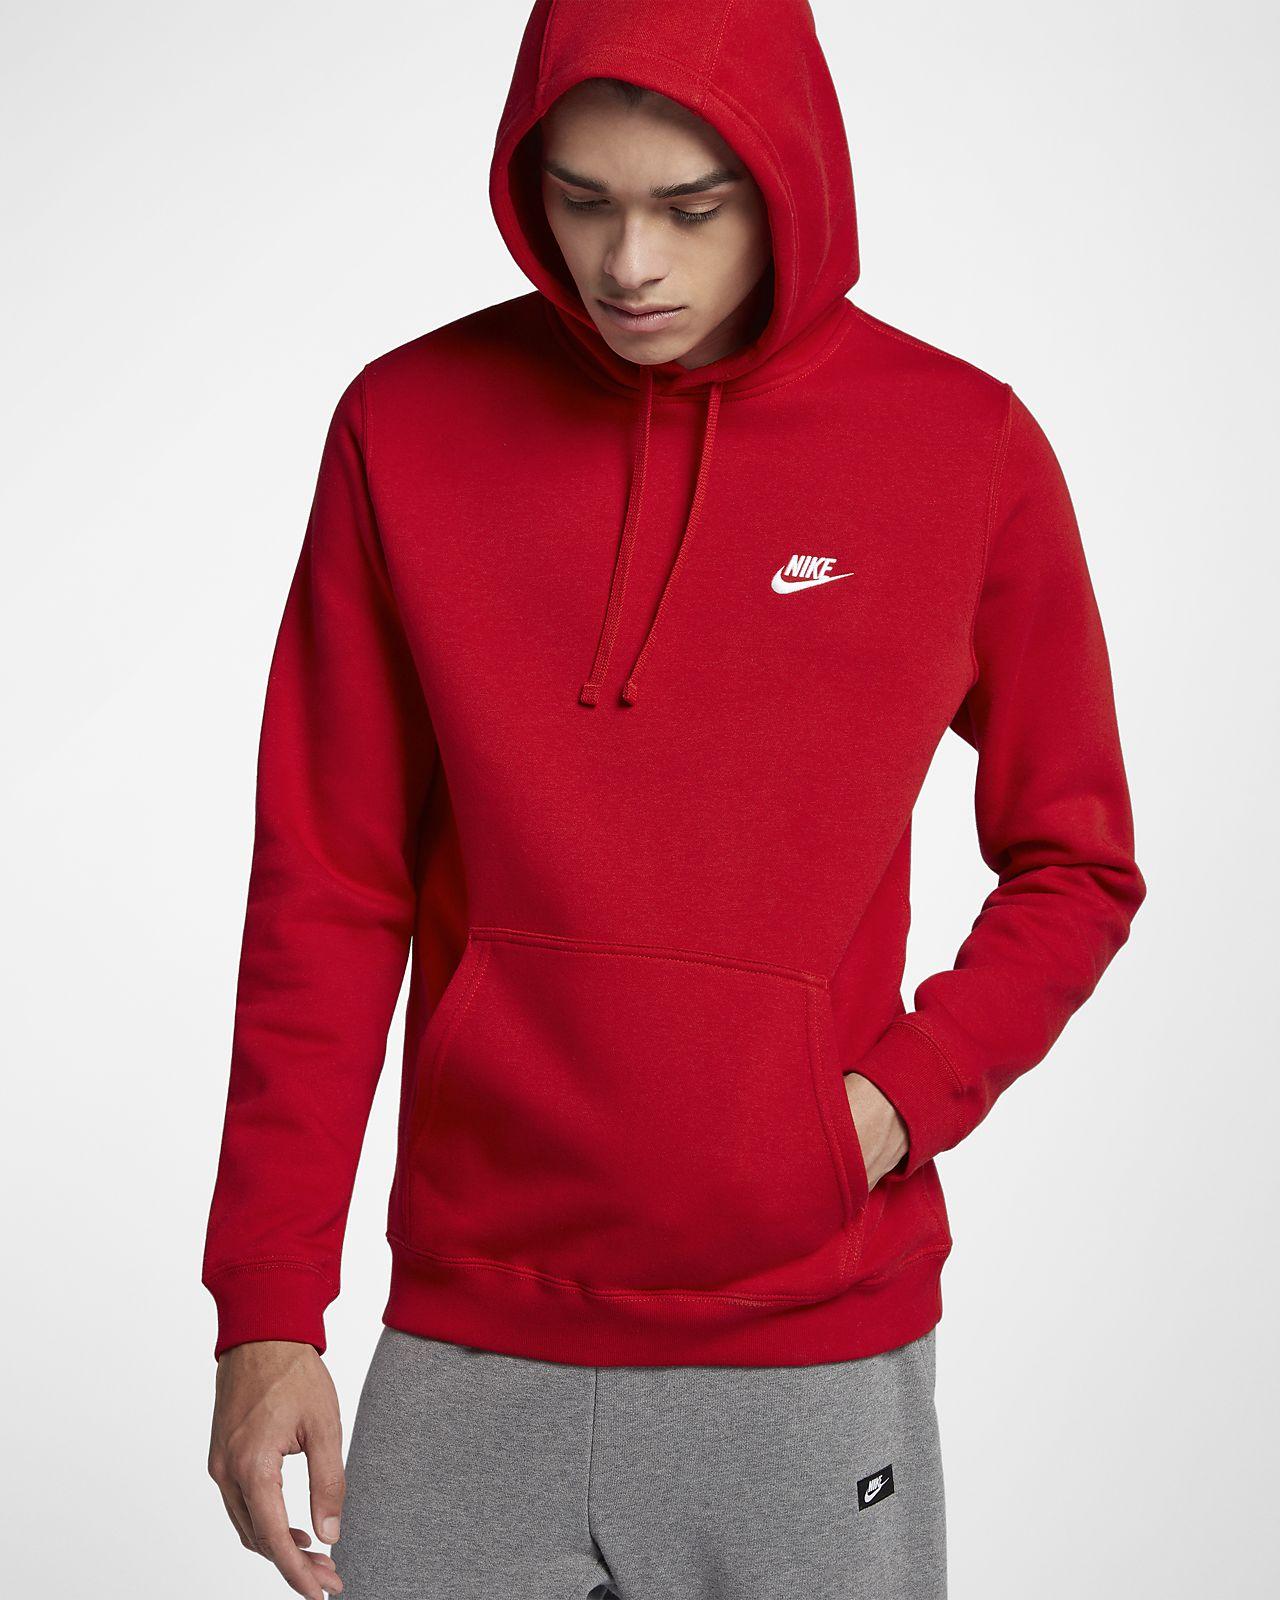 cf4e3d127a Nike Sportswear Pullover Hoodie. Nike.com